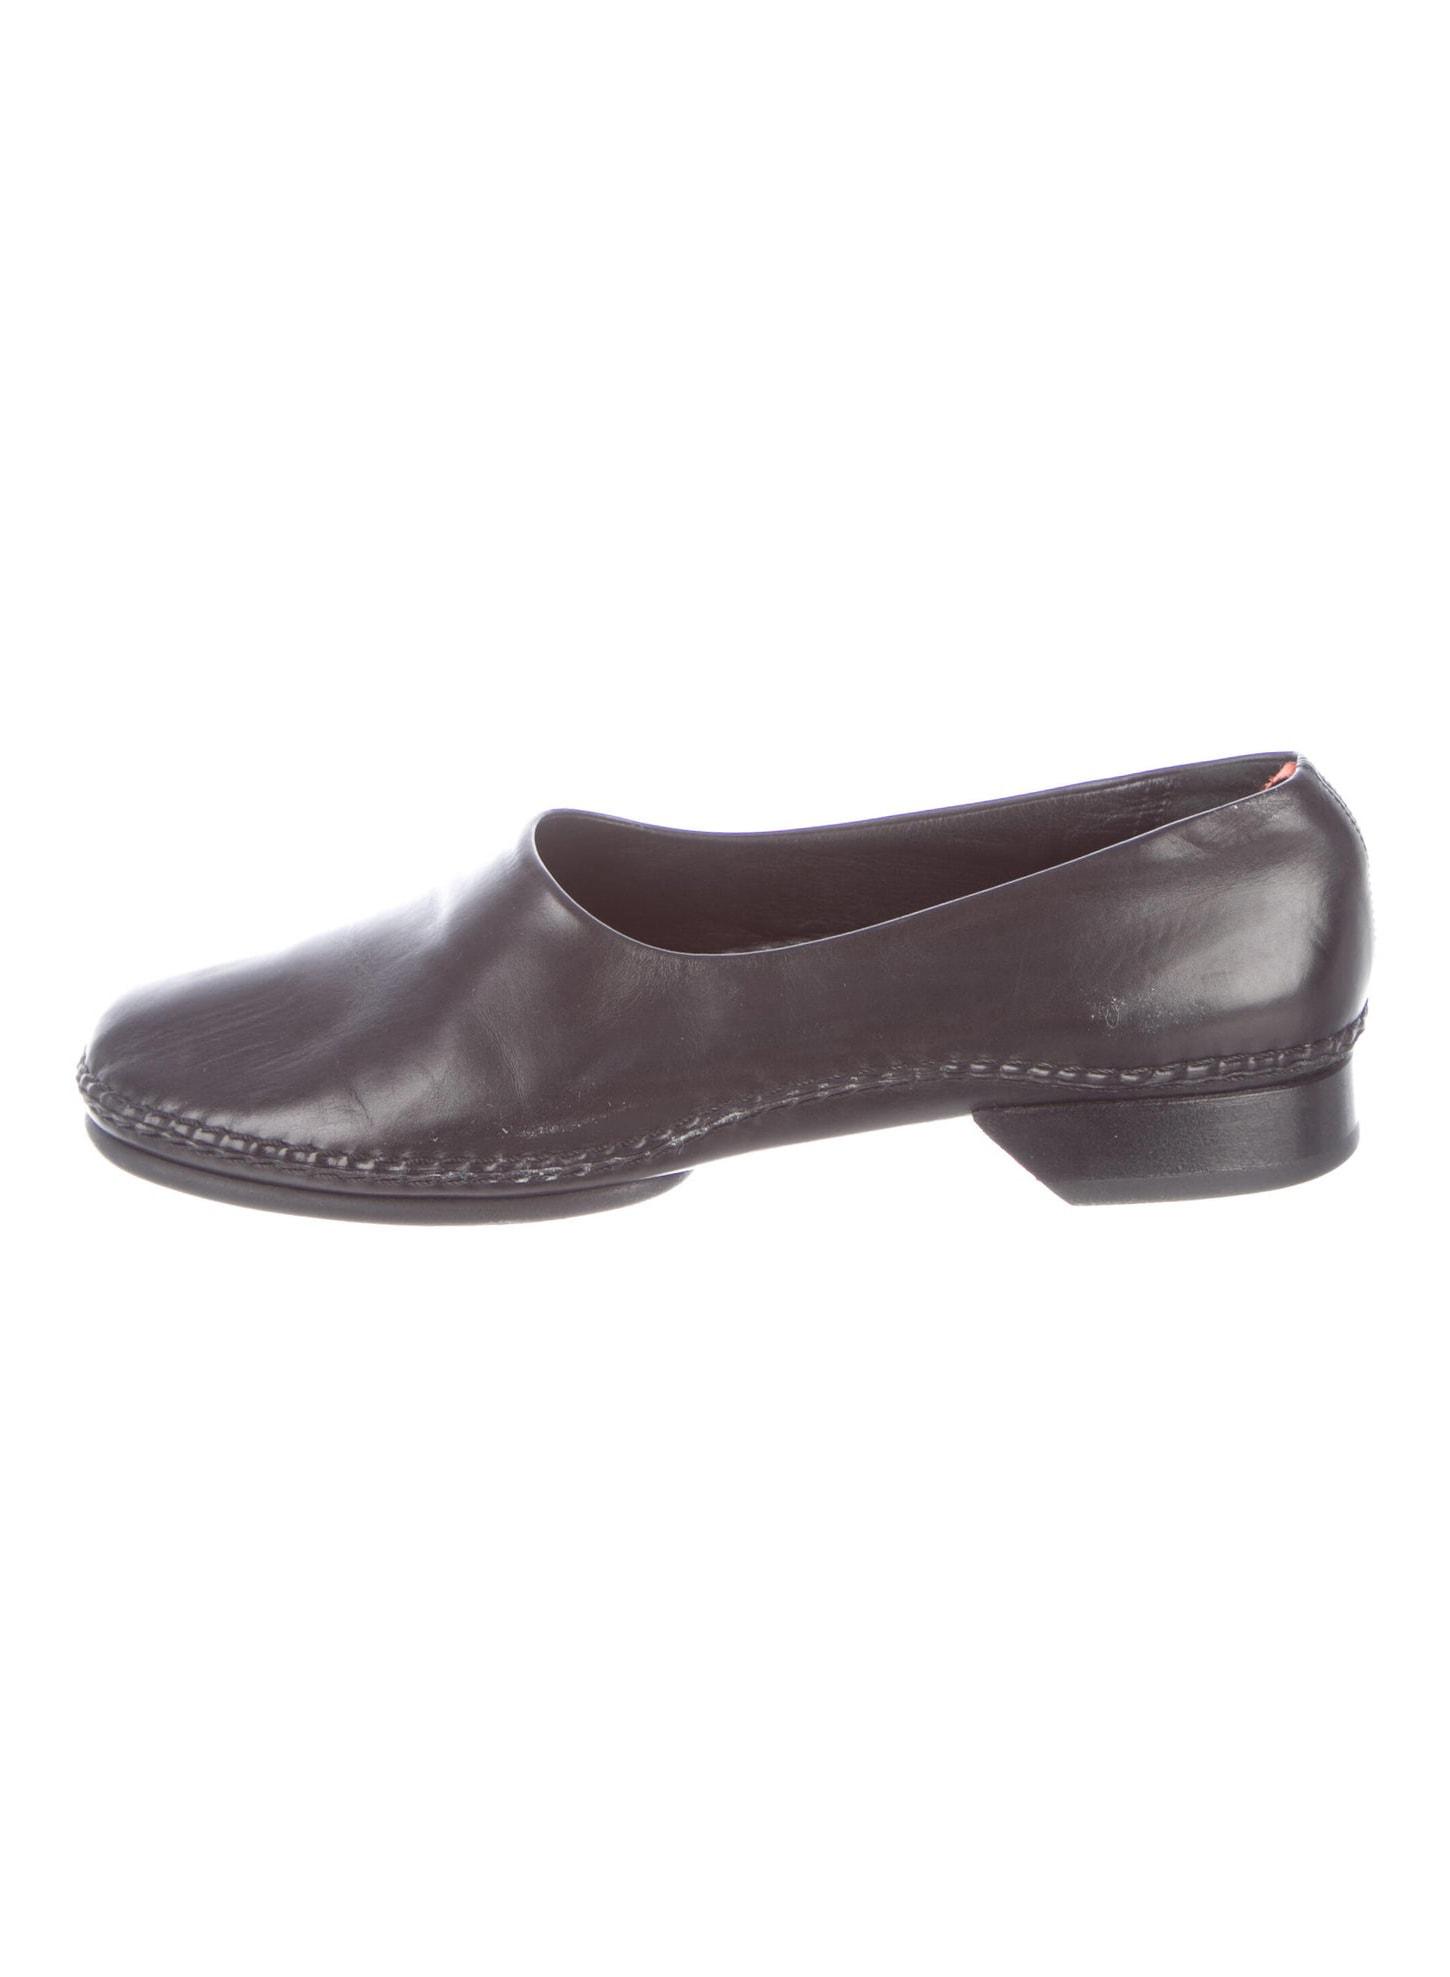 HERMÈS Vintage Leather Loafers Size 8